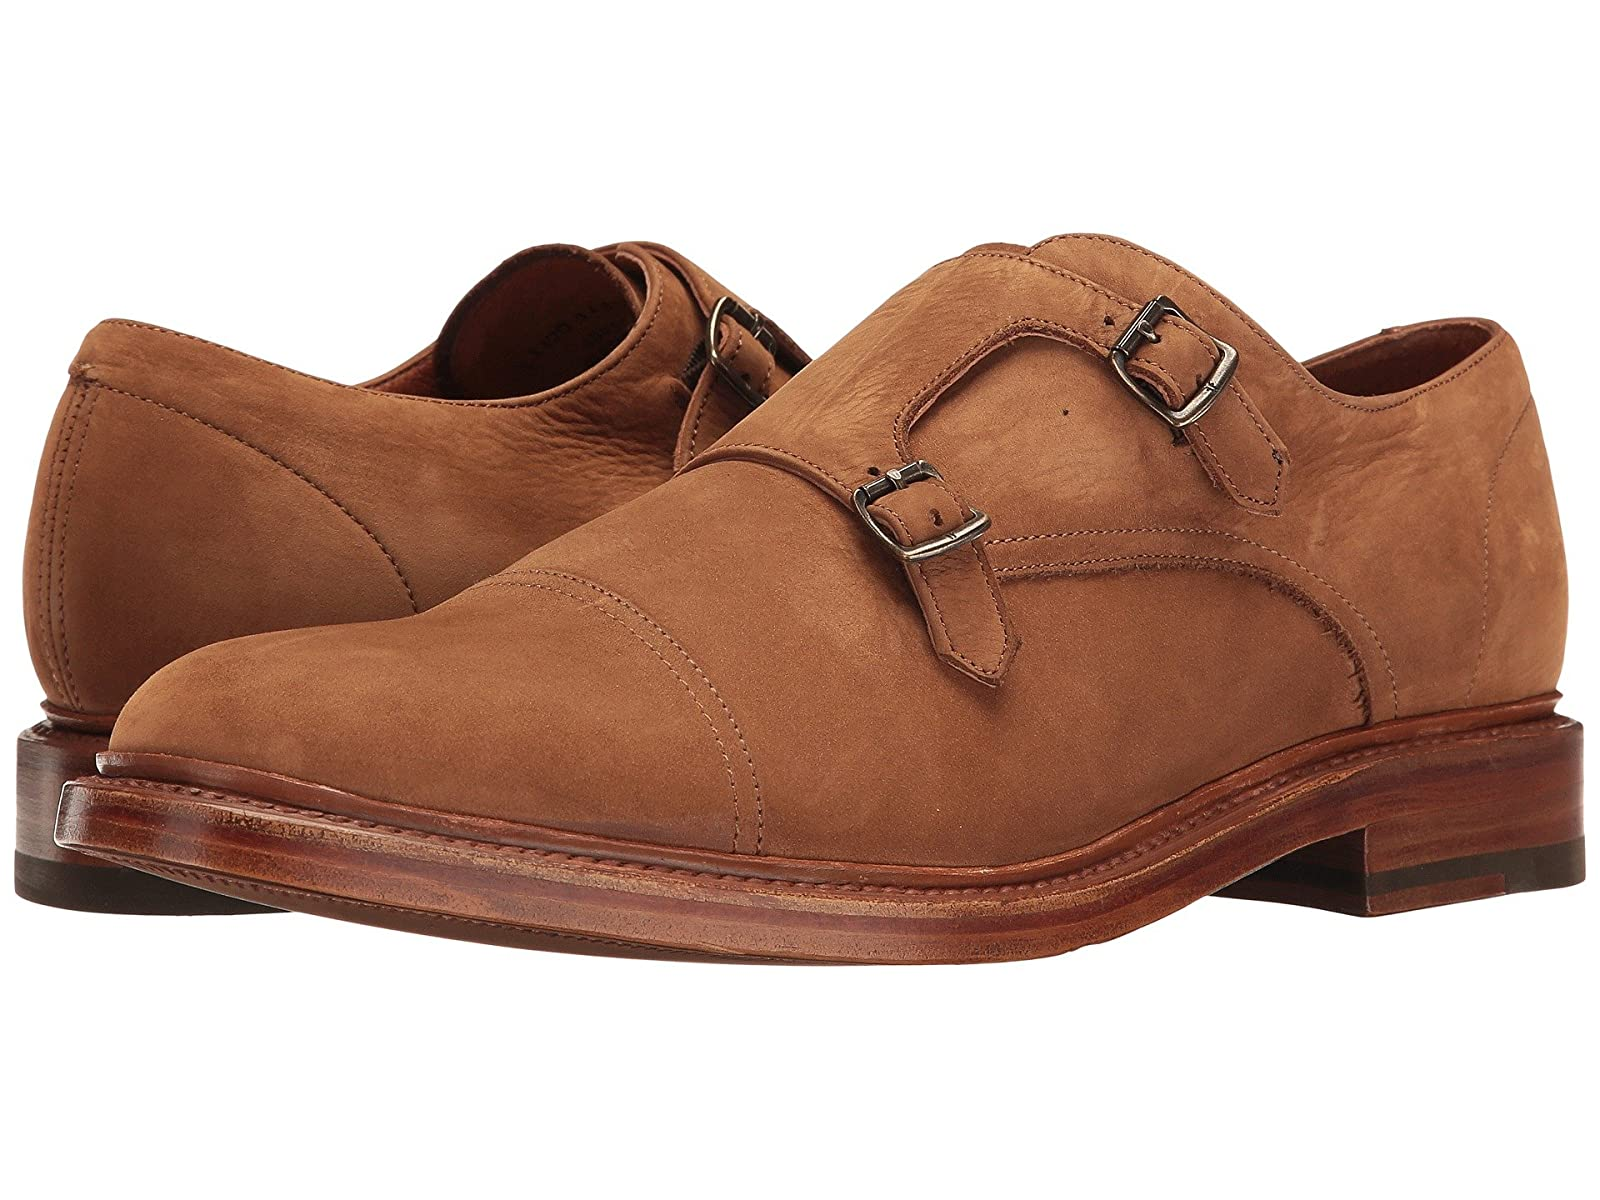 Frye Jones Double MonkCheap and distinctive eye-catching shoes